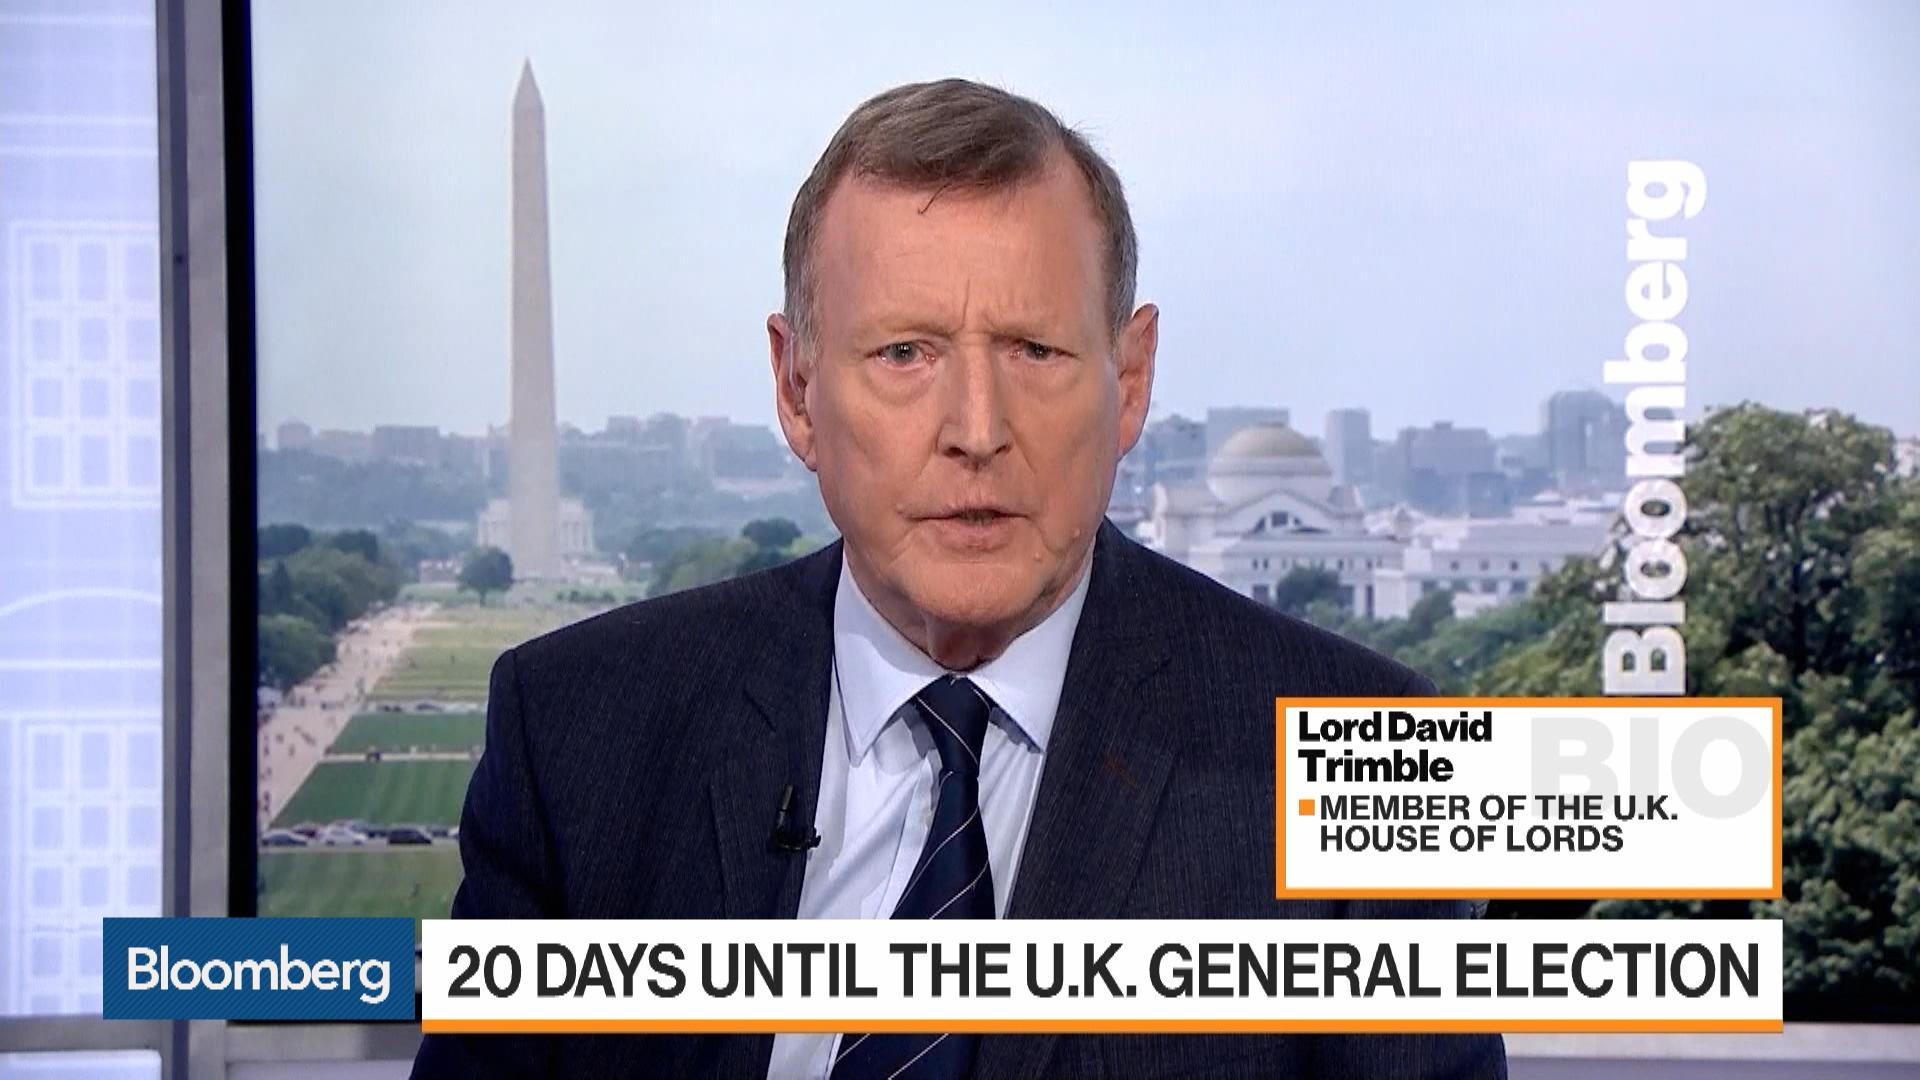 No Conflict Between Brexit, Belfast Agreement: Lord David Trimble